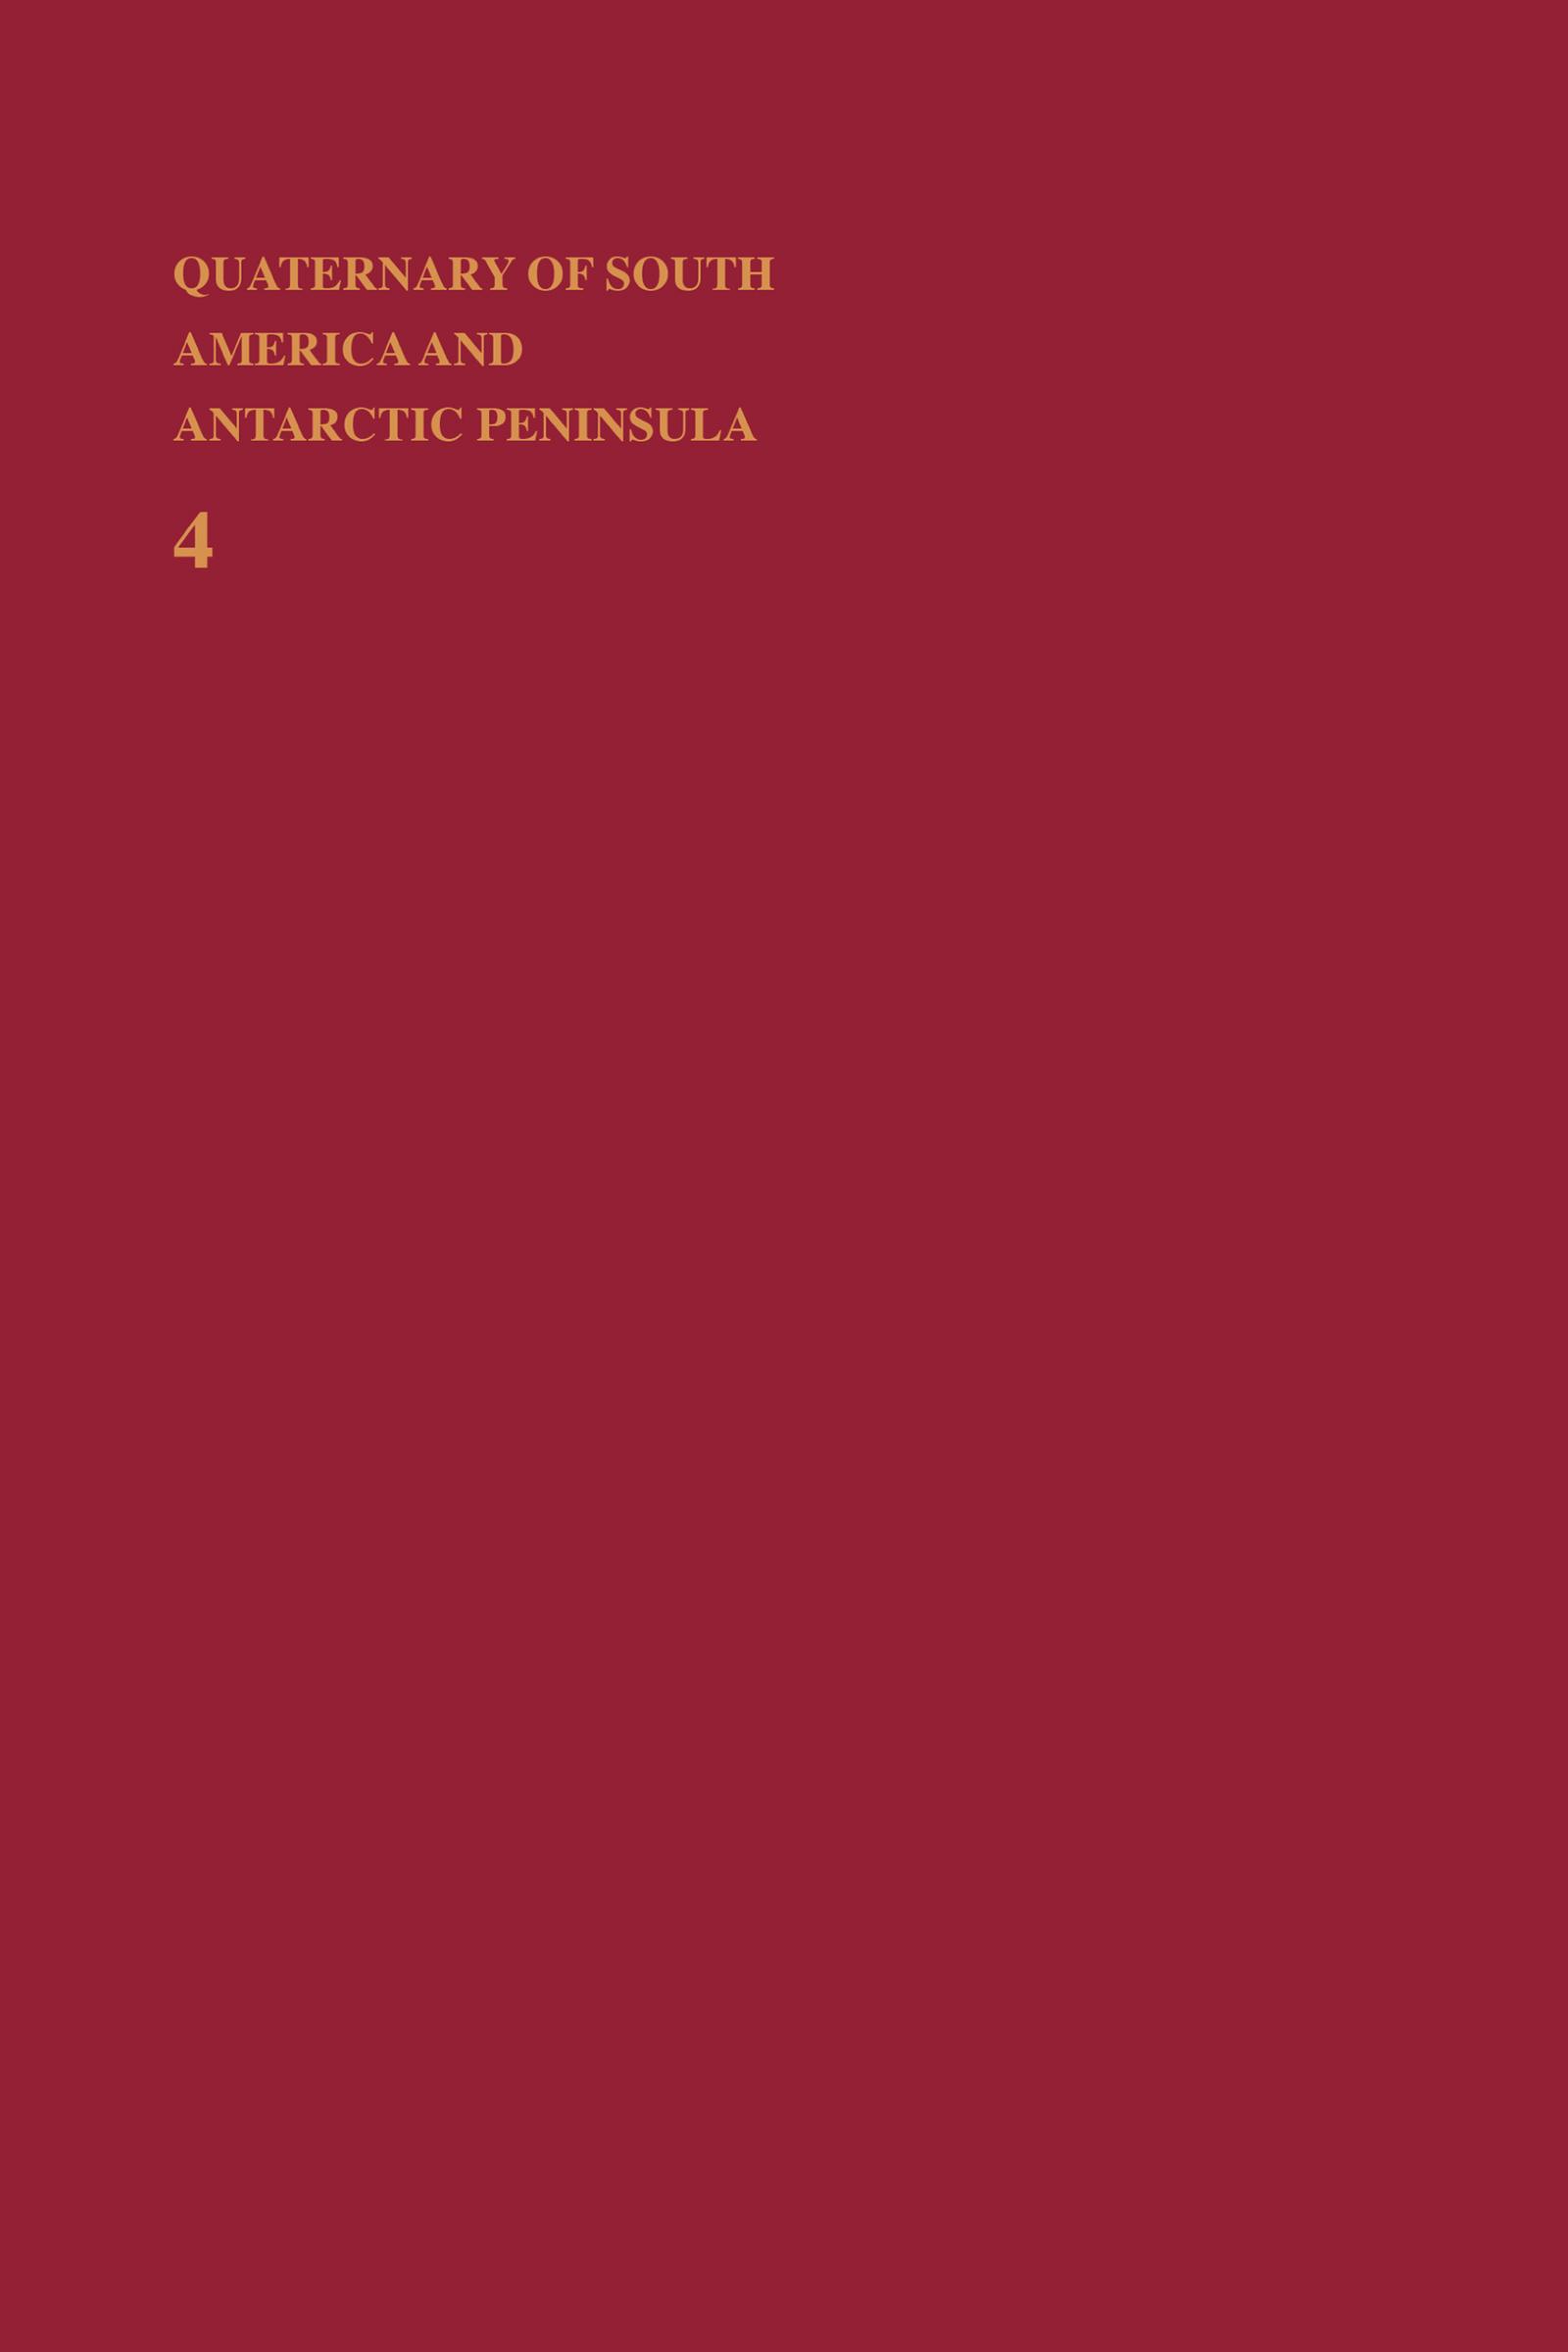 Quaternary of South America and Antarctic Peninsula